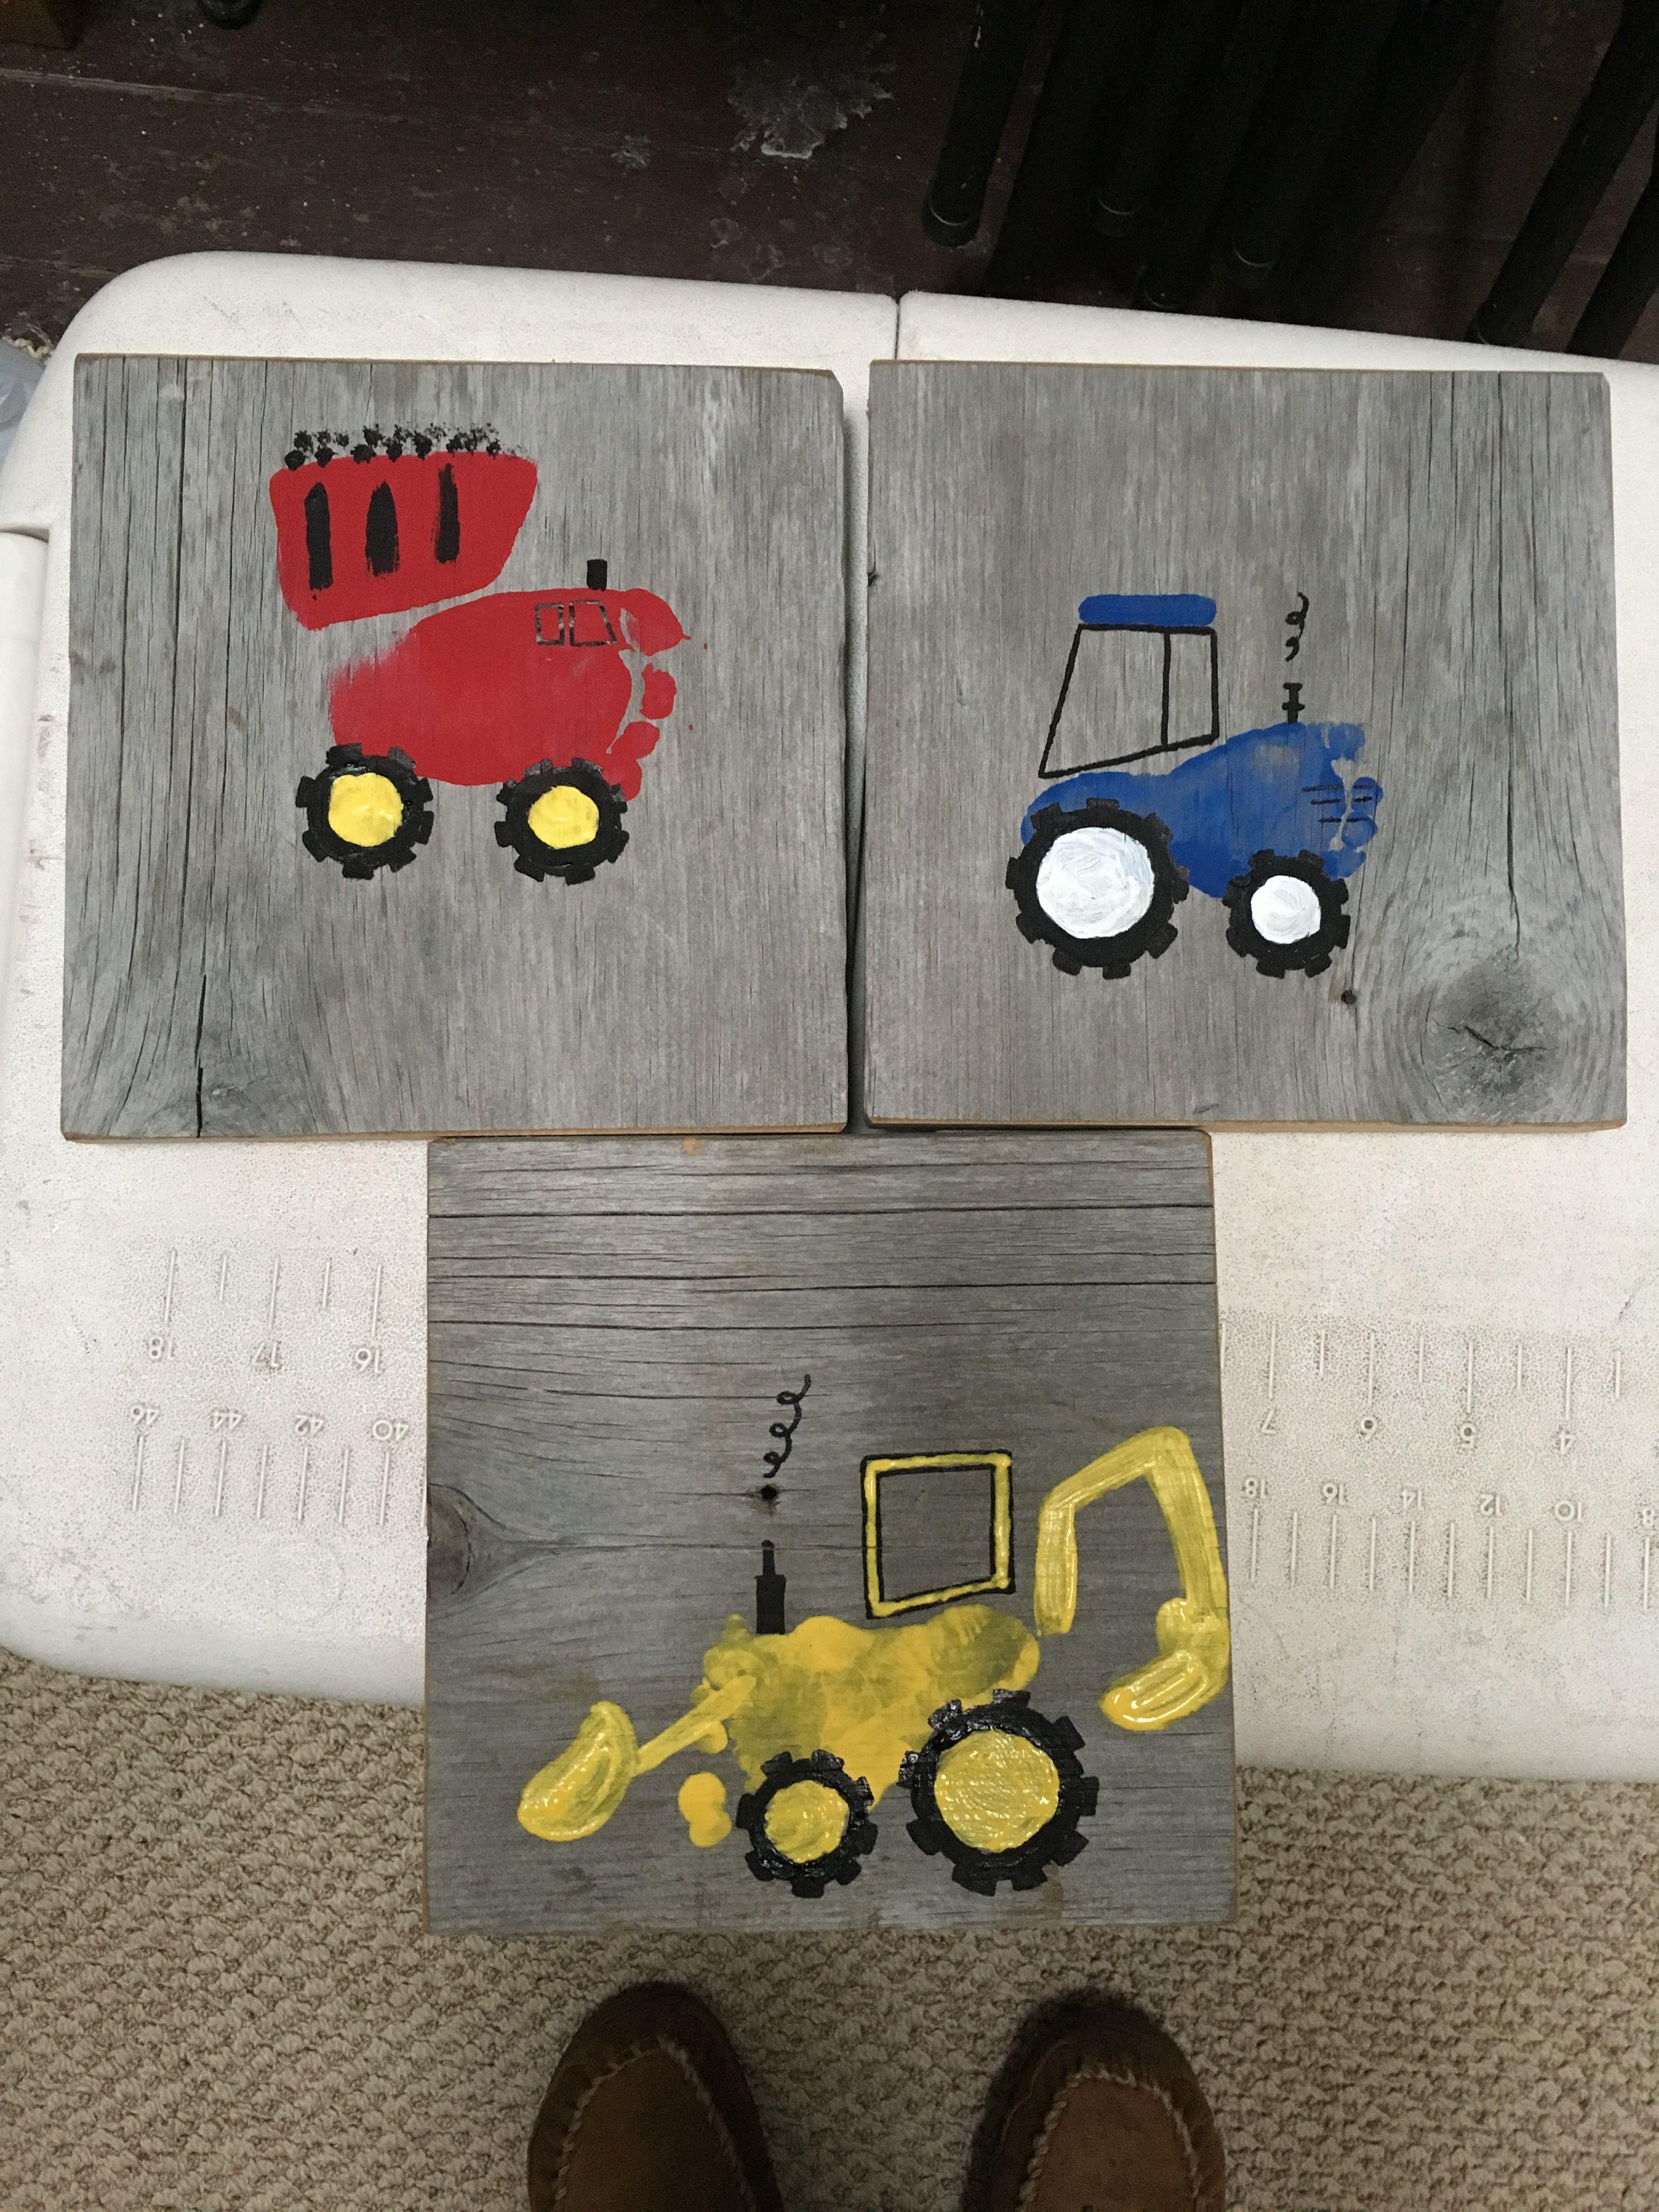 Foot print construction vehicles DIY. Dump truck, tractor, back hoe.